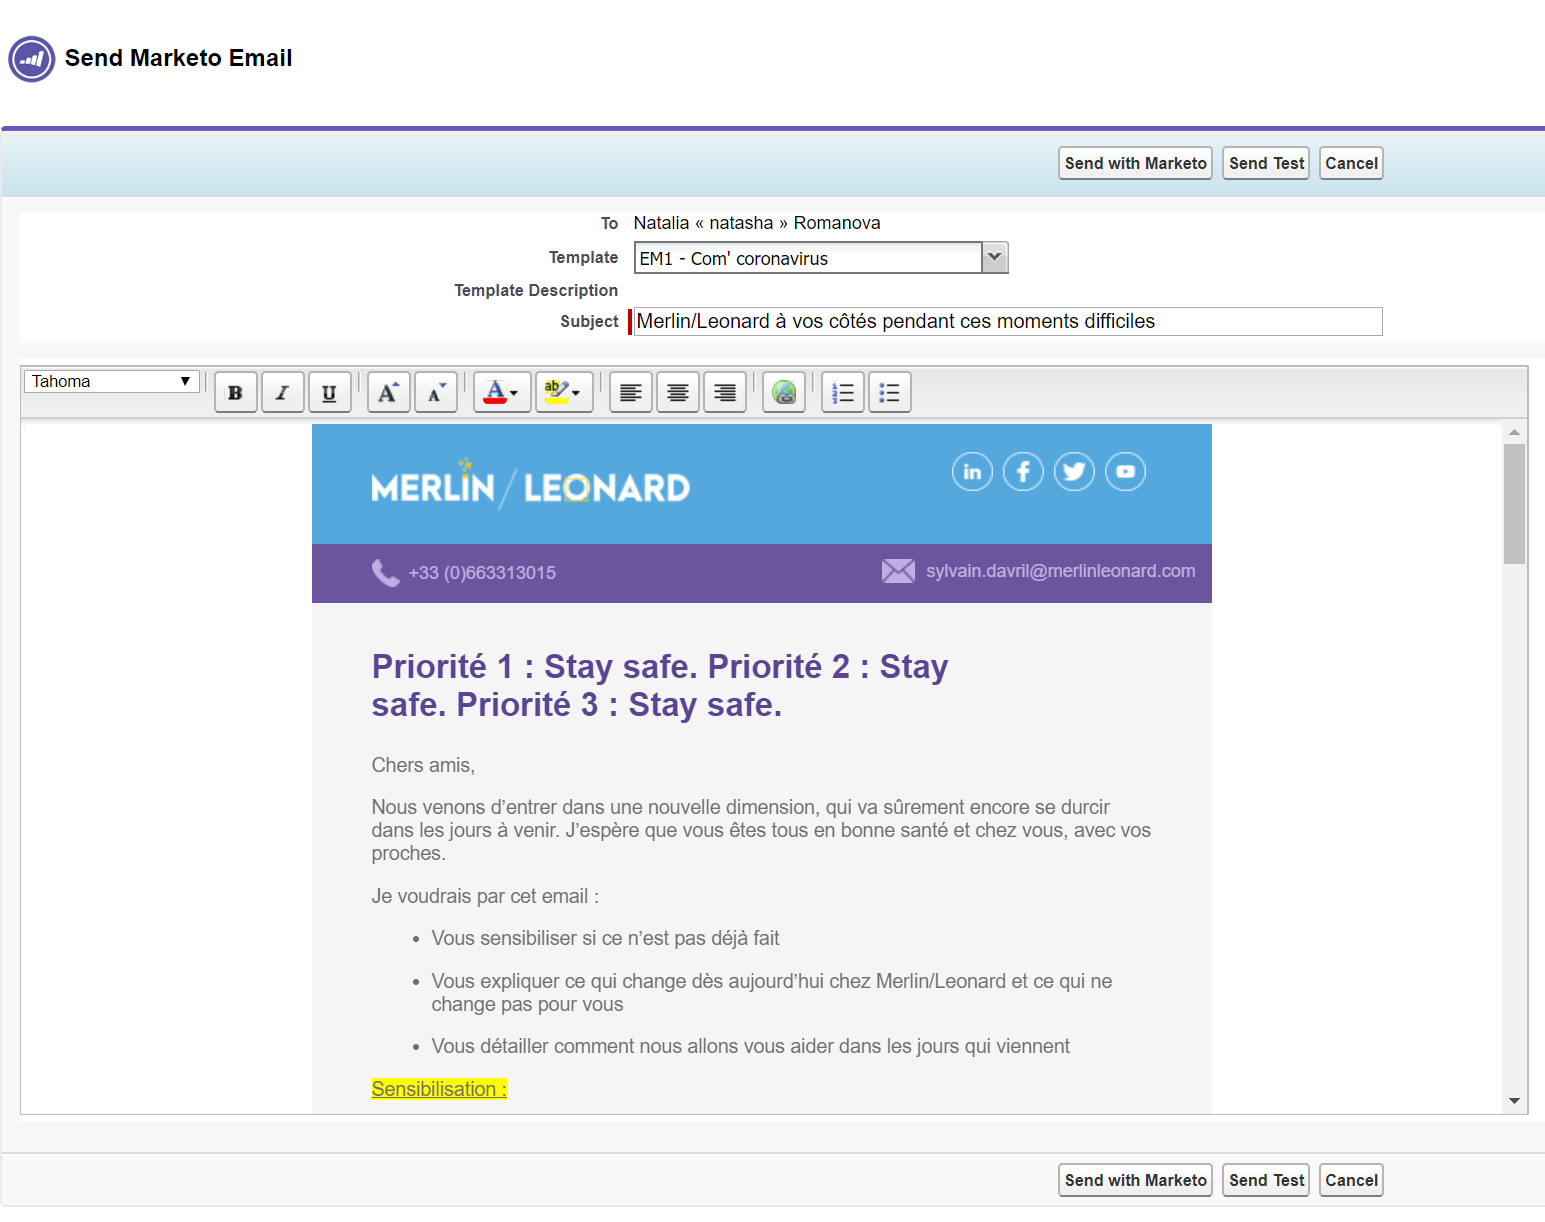 envoyer un email marketo dans le match marketo vs hubspot